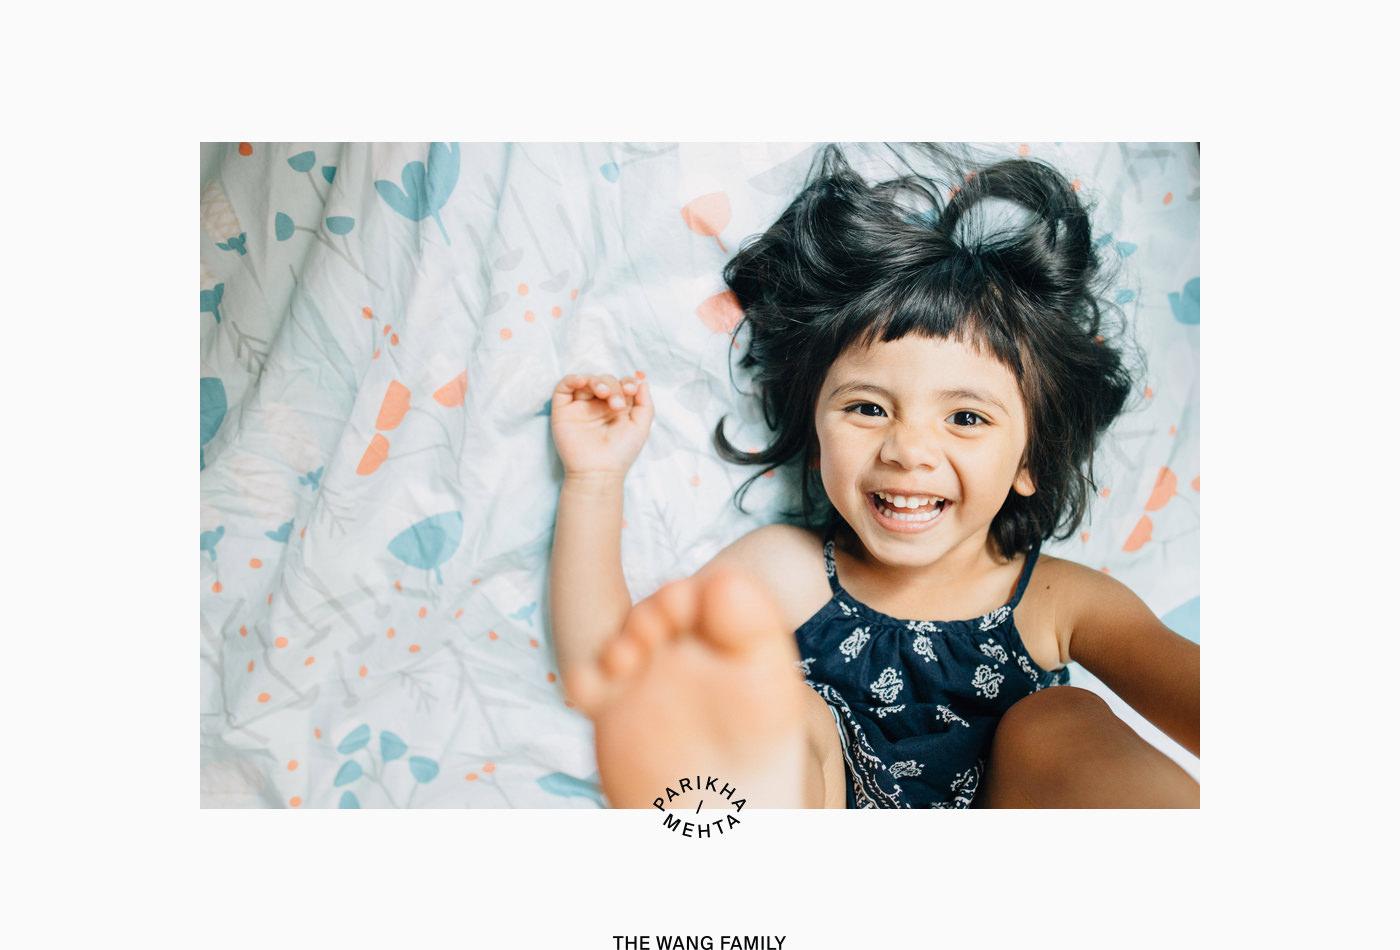 parikha-mehta-parikhamehta-photography-philadelphia-philly-family-editorial-pm-branding-brand-system-letterhead-invoice-vacaliebres-wang2